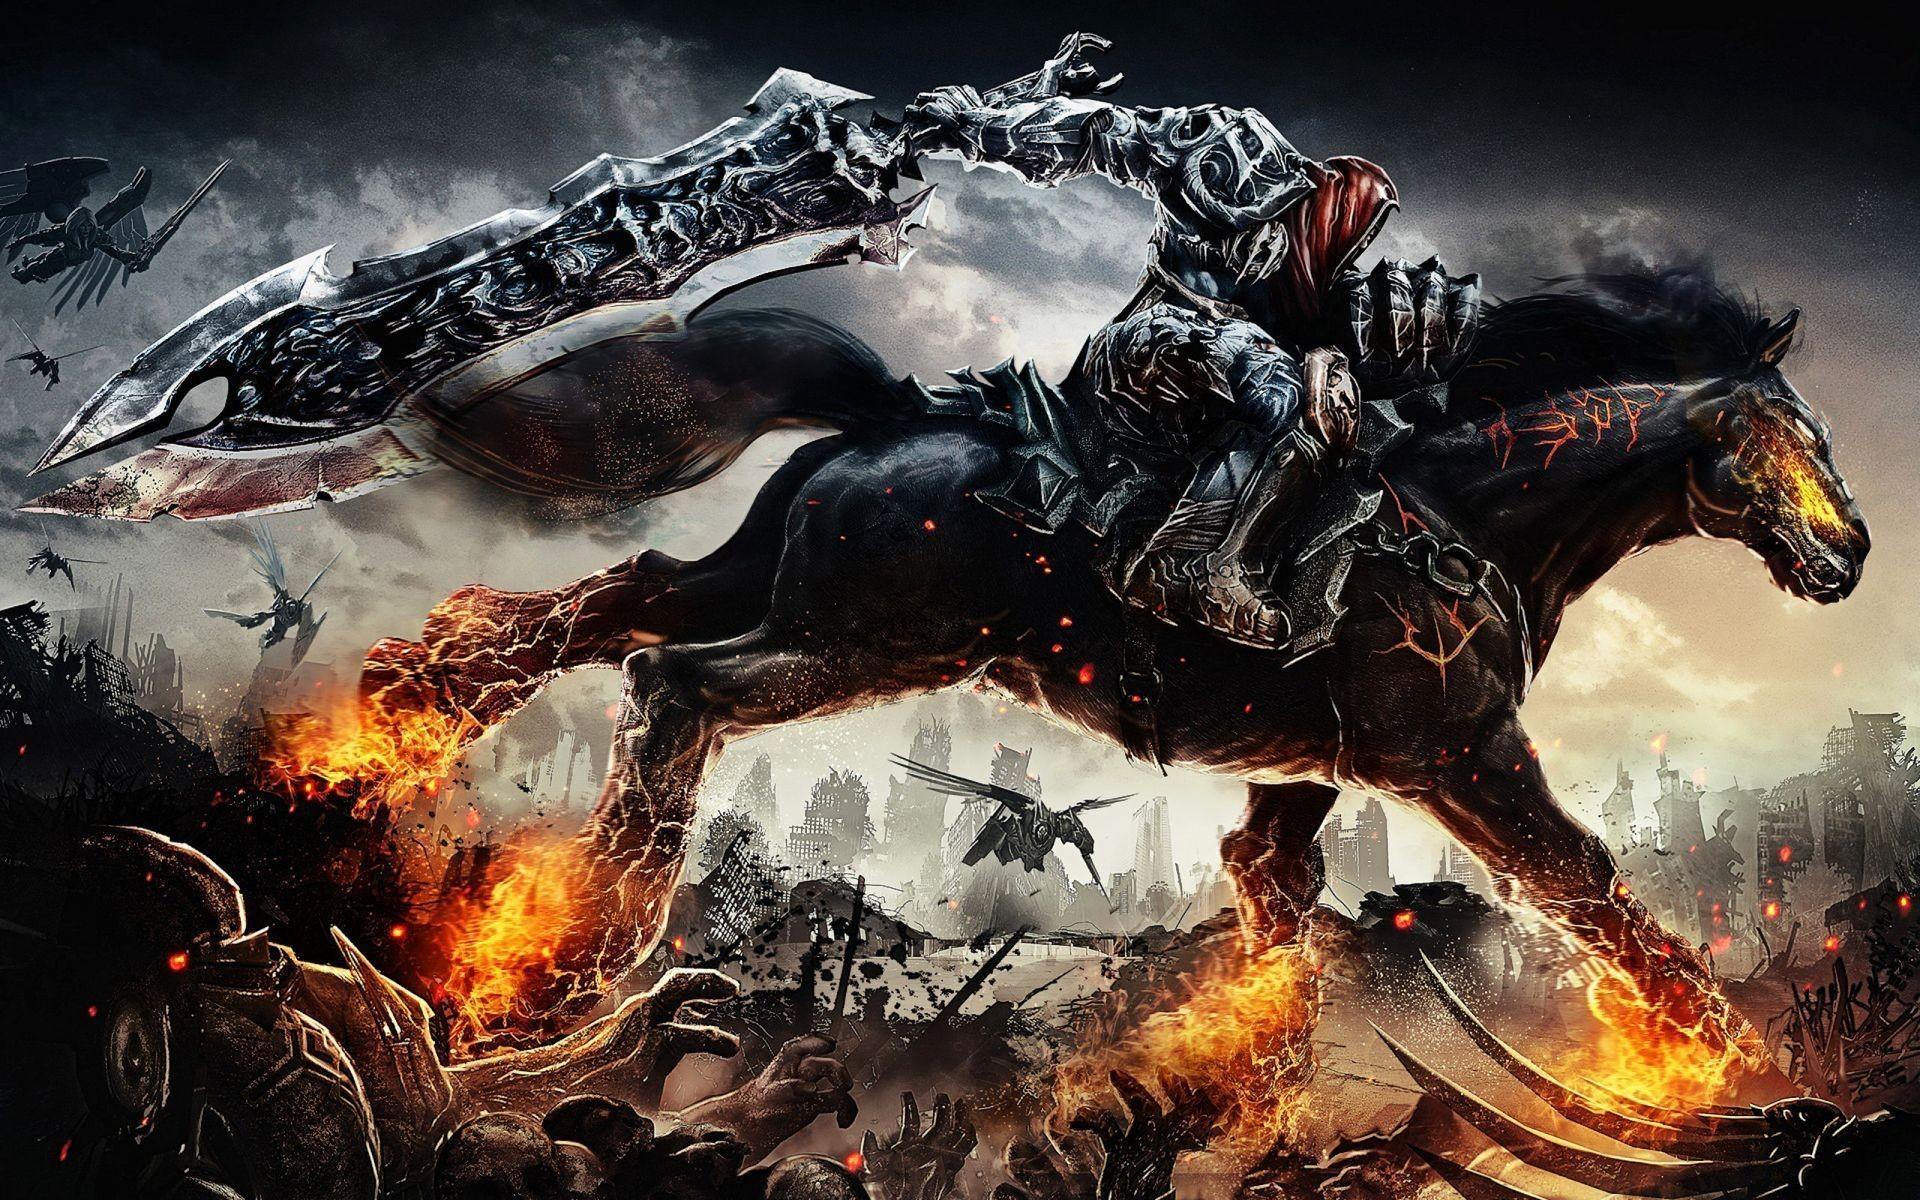 Beautiful 1920x1200 Fire Horse Dark Warrior Wallpaper #106005